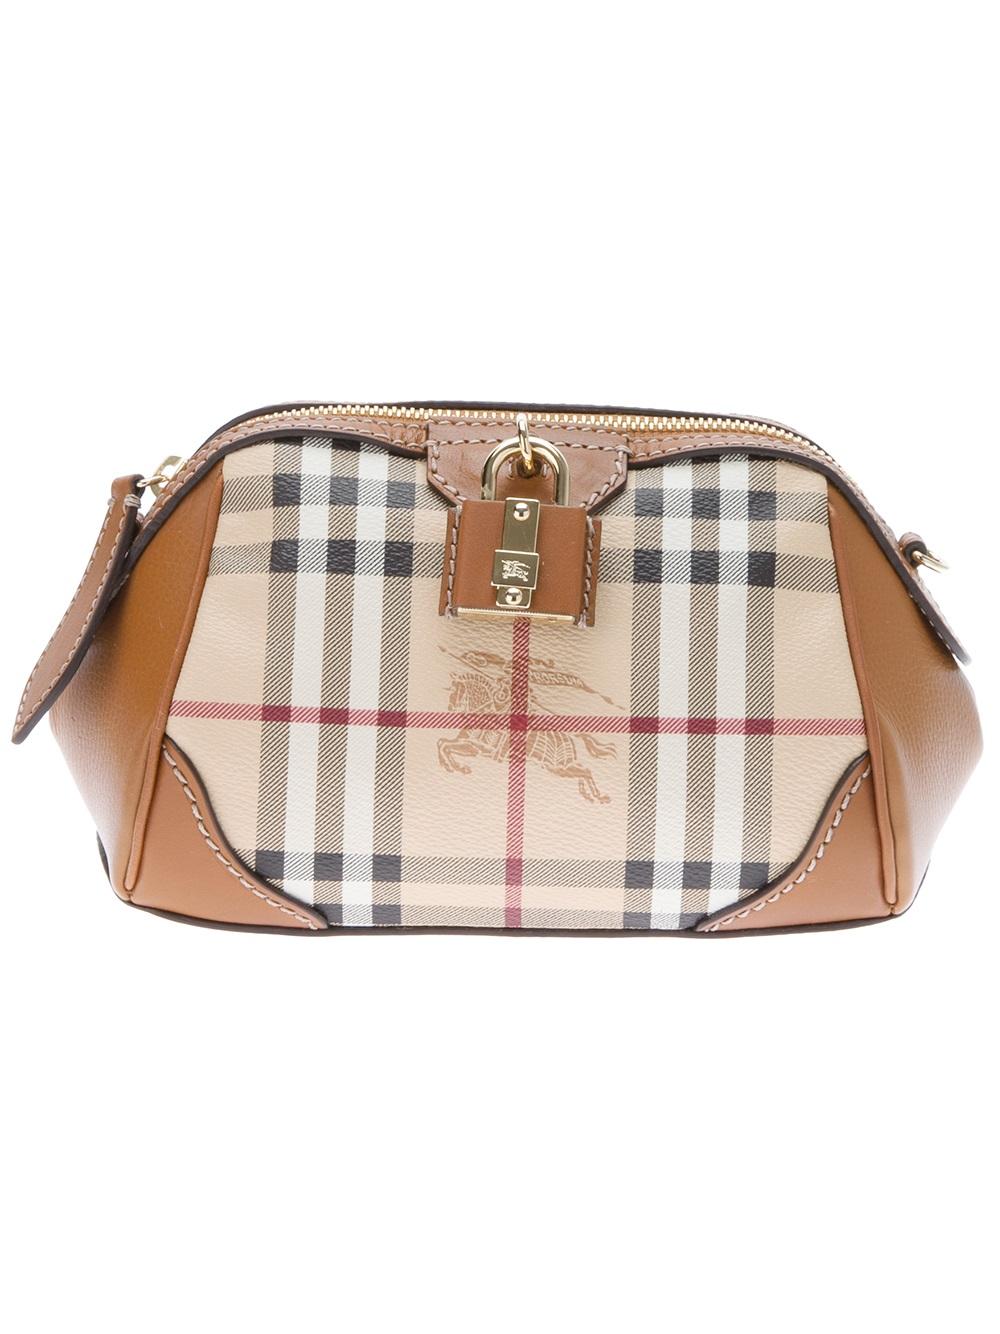 e07761adaa6c Lyst - Burberry Prorsum Mini Blaze Crossbody Bag in Brown